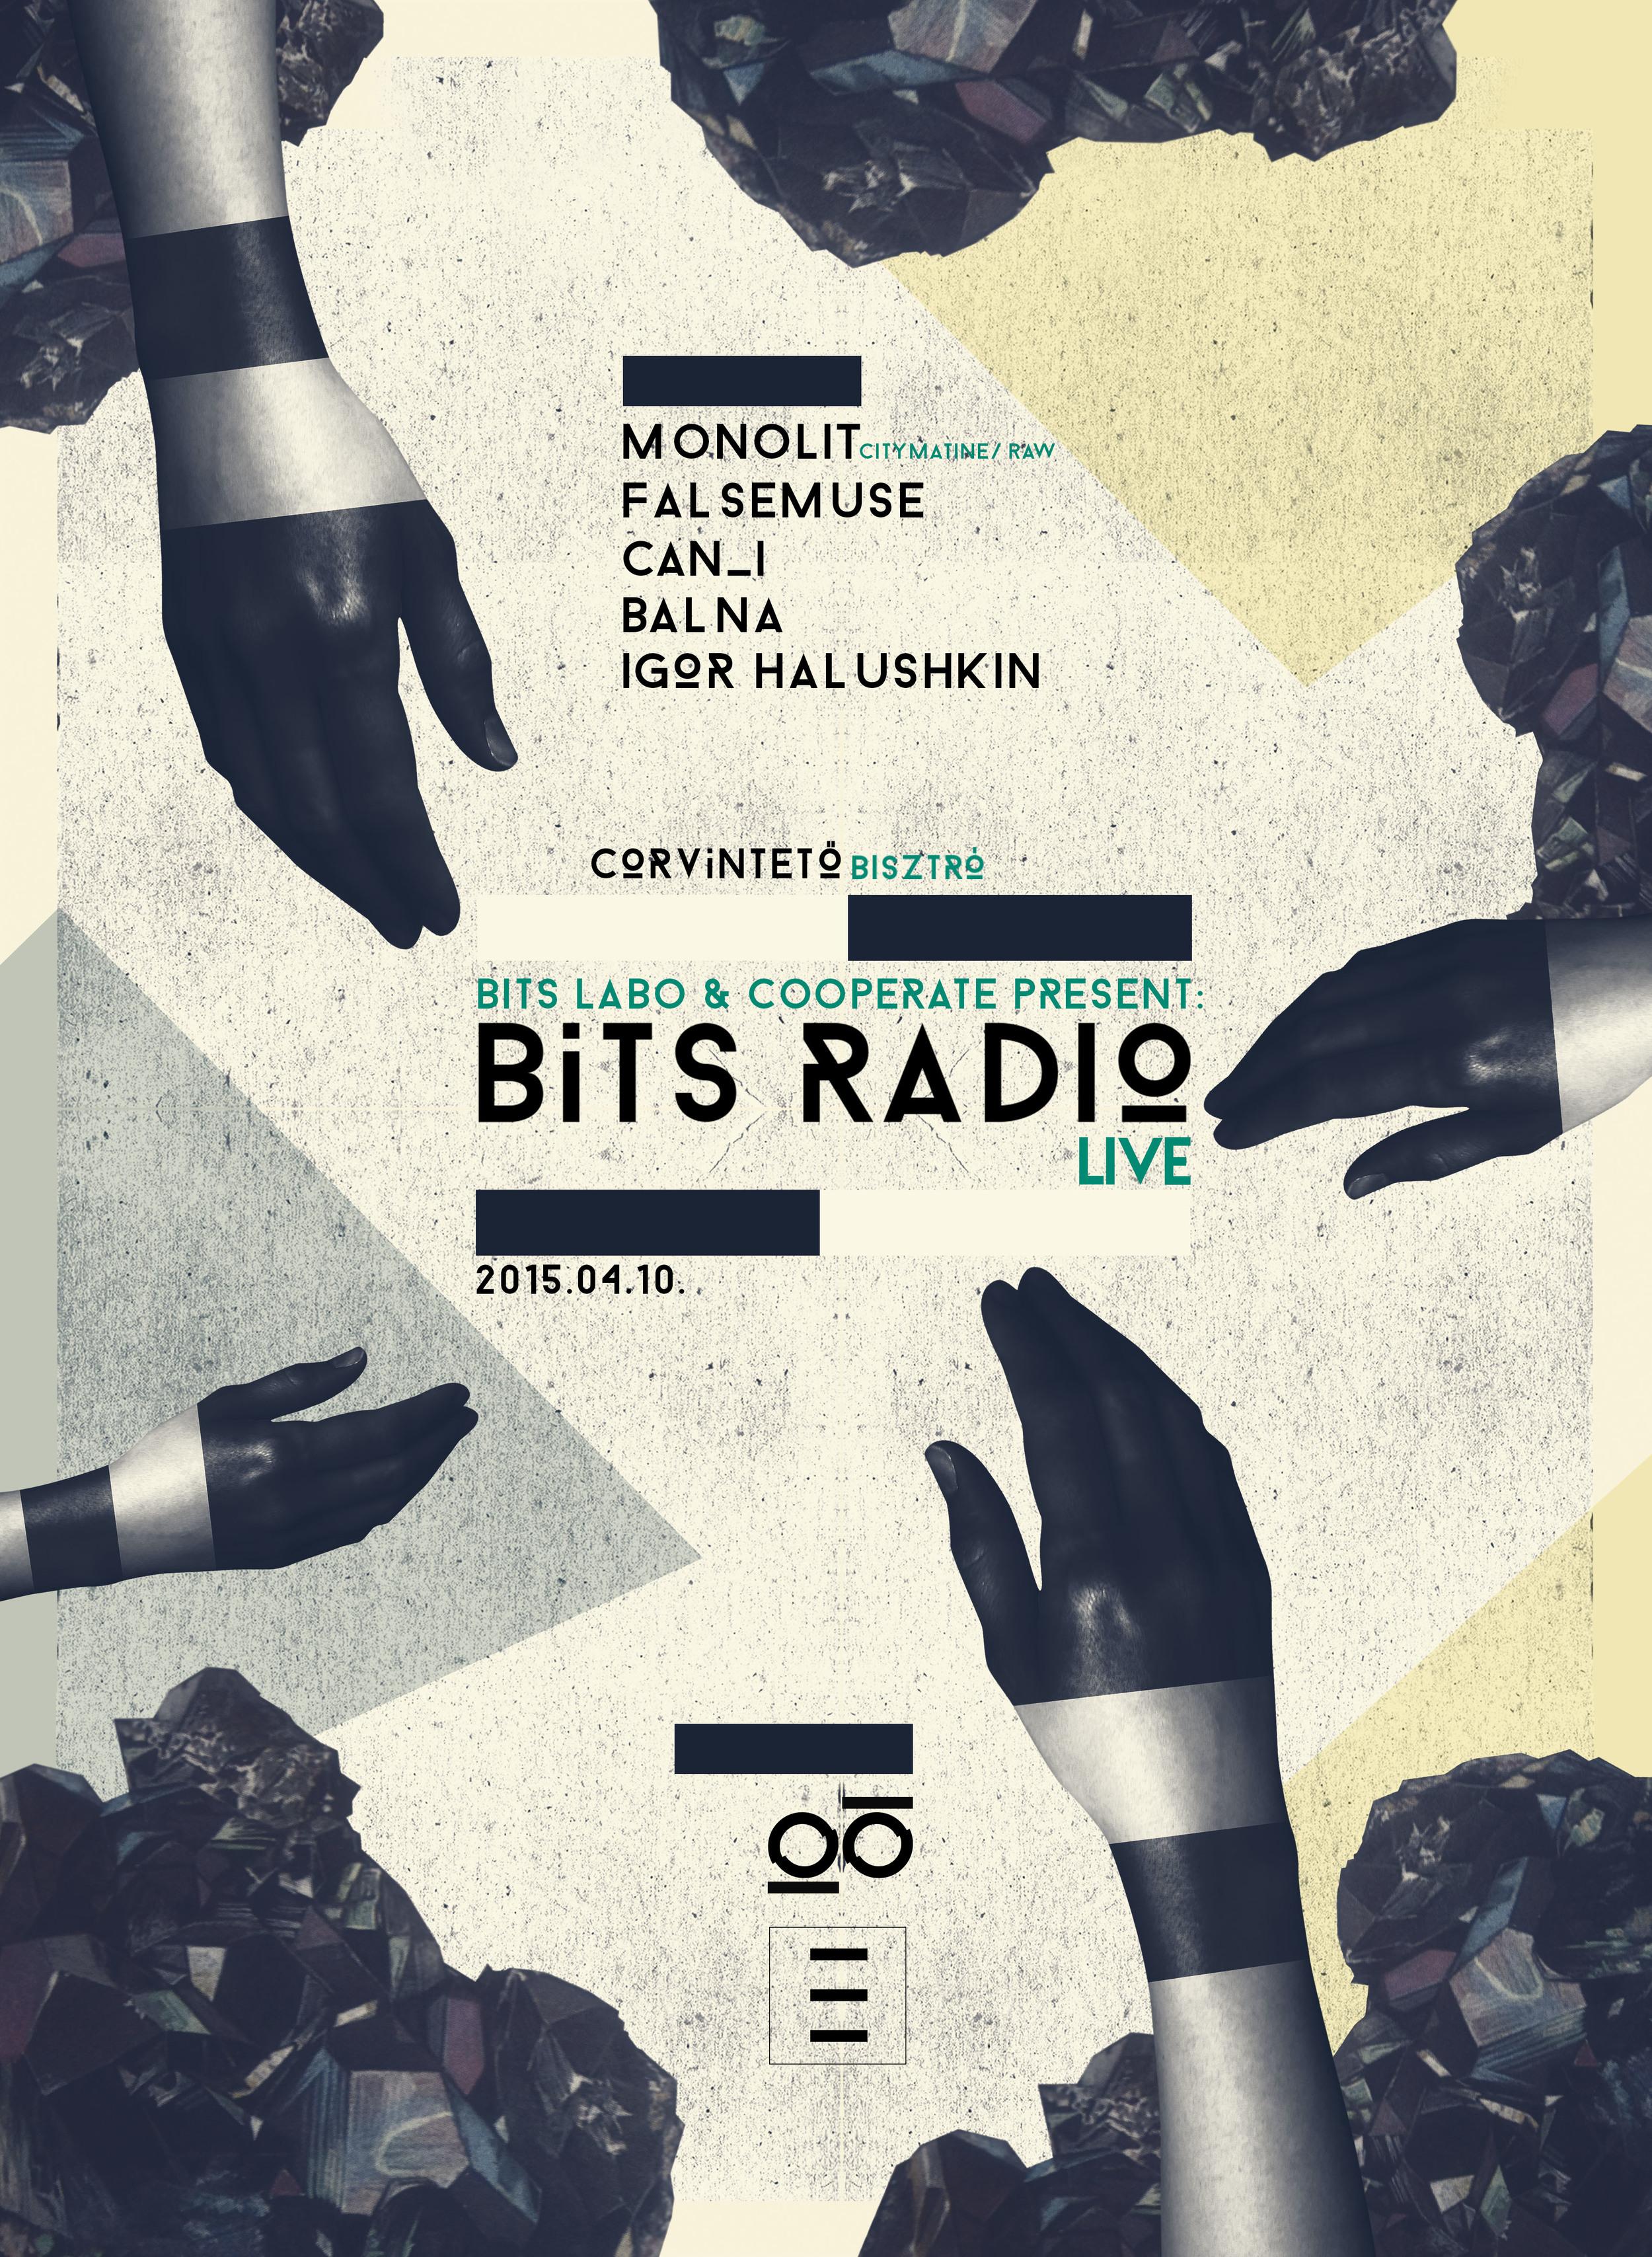 BiTS_radio_LiVE_eventbanner_A4.jpg